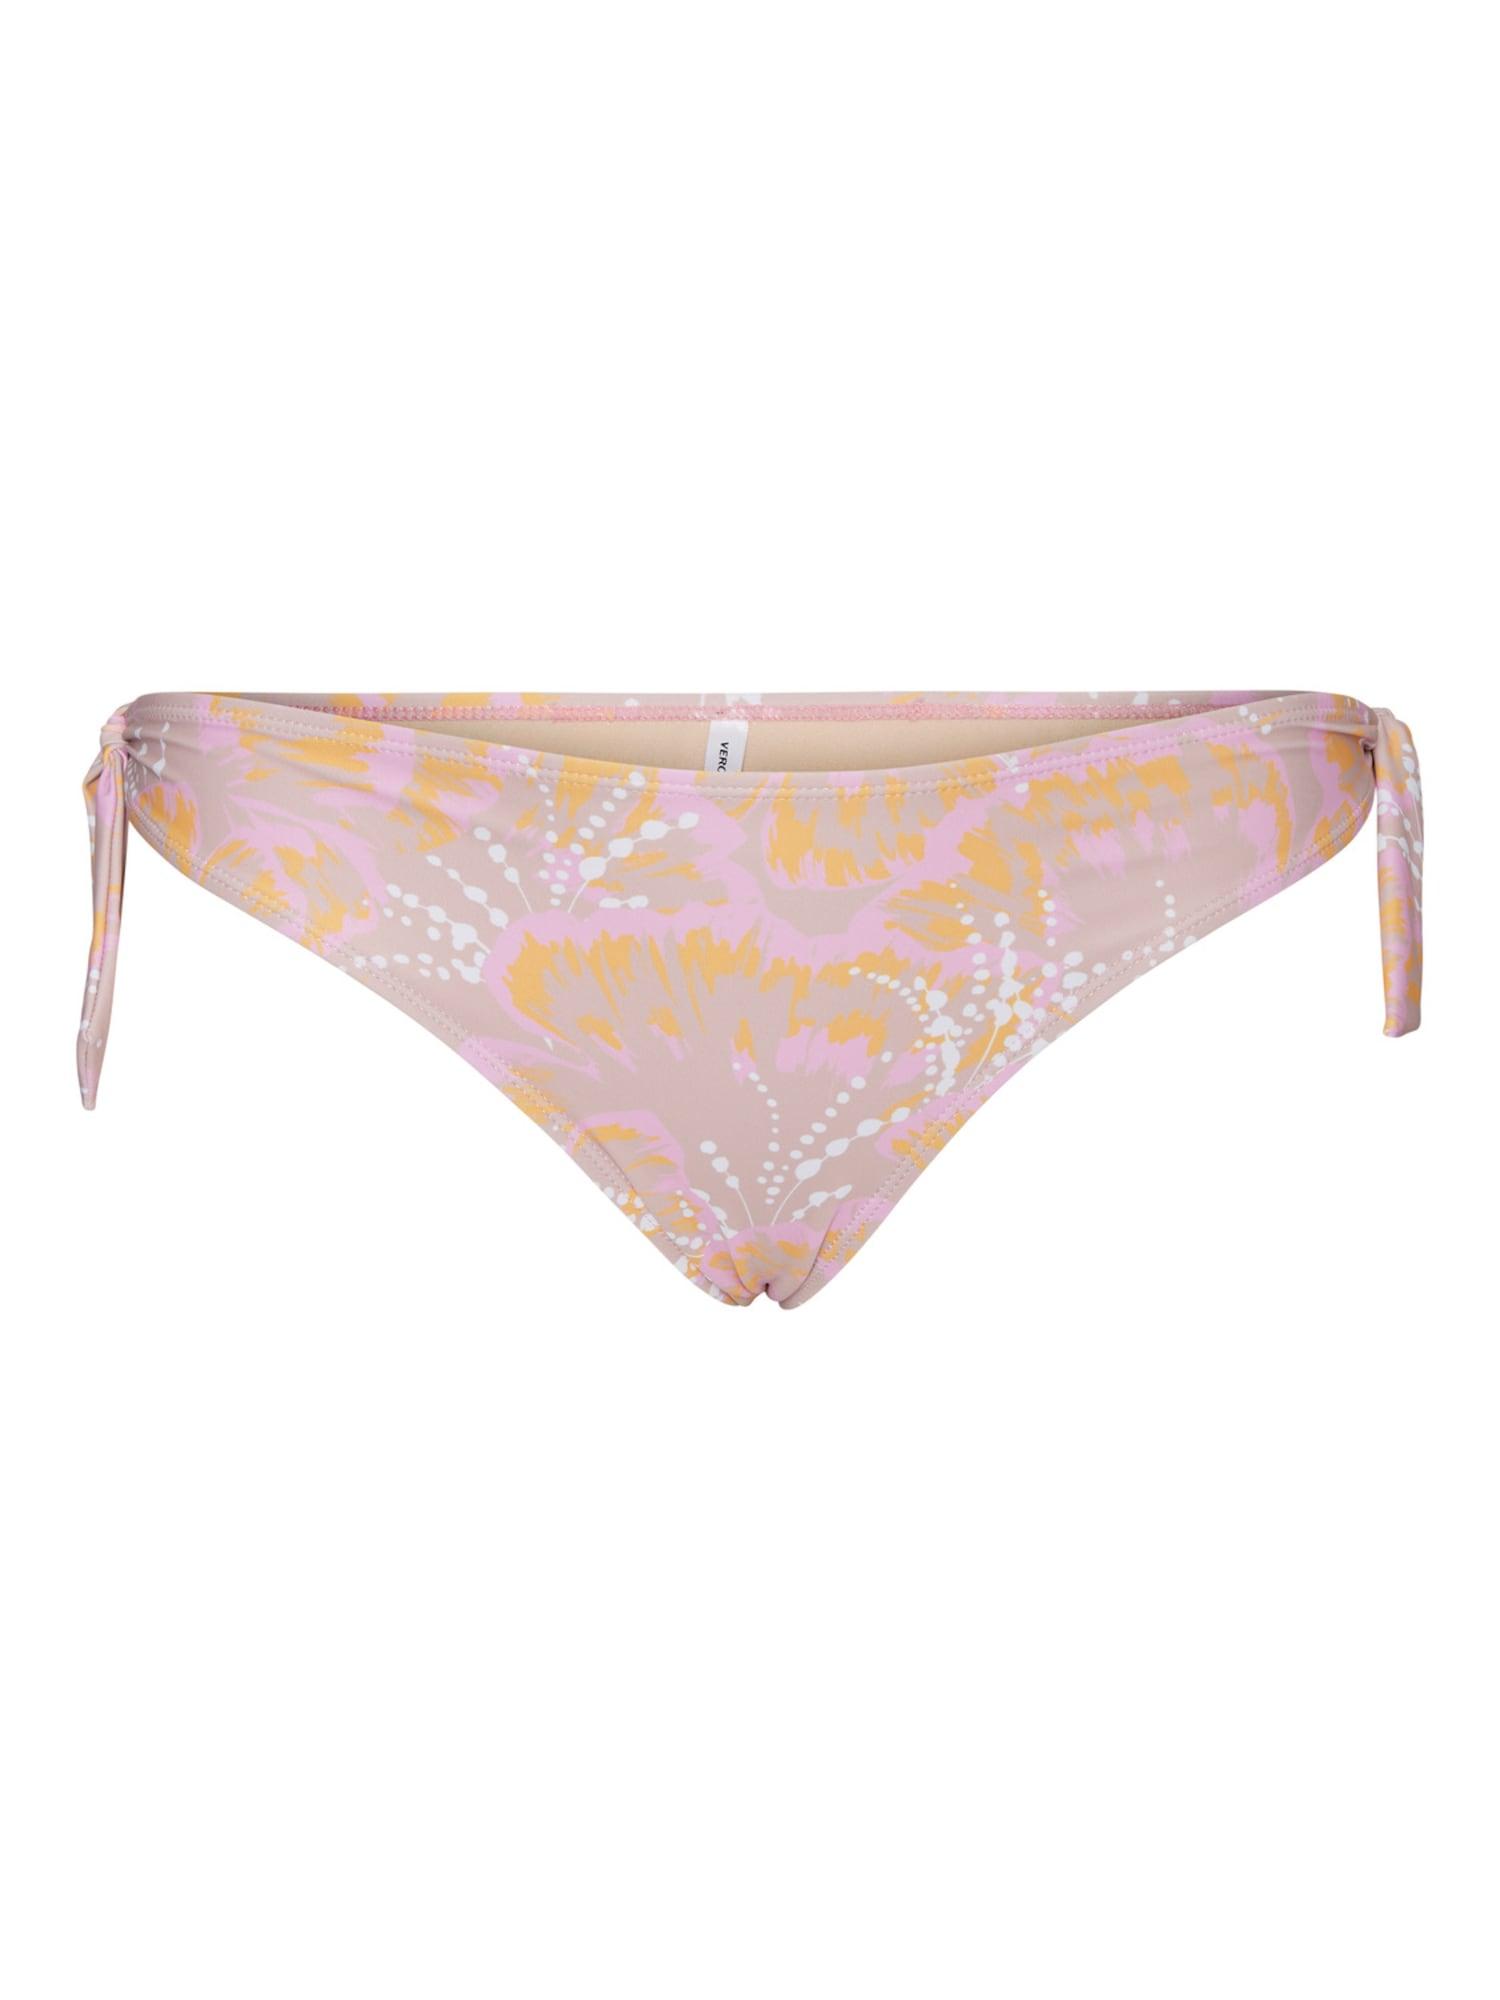 Vero Moda Curve Spodní díl plavek 'Leur'  růže / bílá / šeříková / oranžová